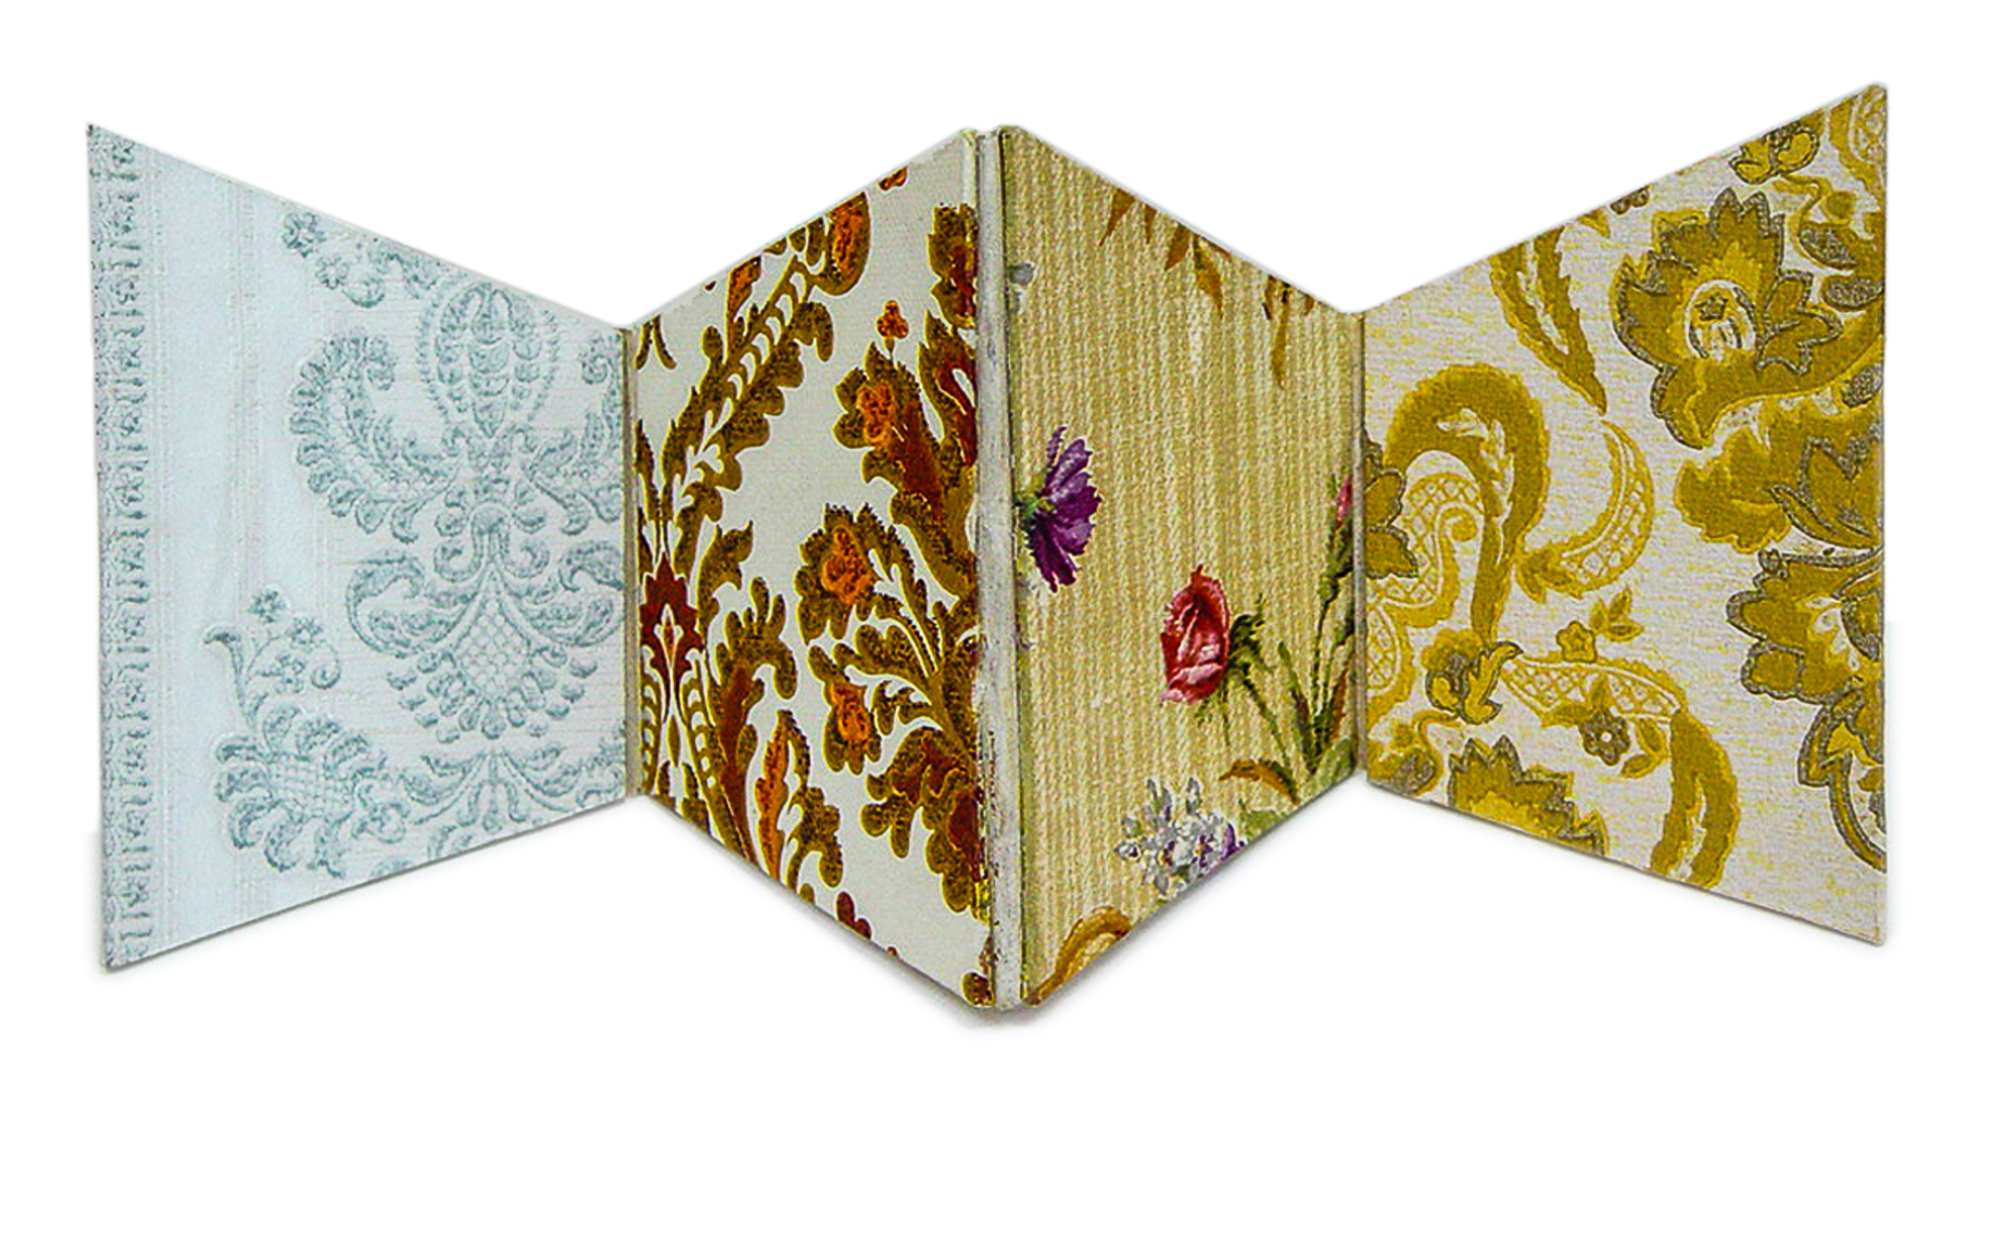 Magnolia Soto. Diorama. Topofilia interior. Técnica mixta. 18,5 cm. x 50.5 cm x 2cm. 1998